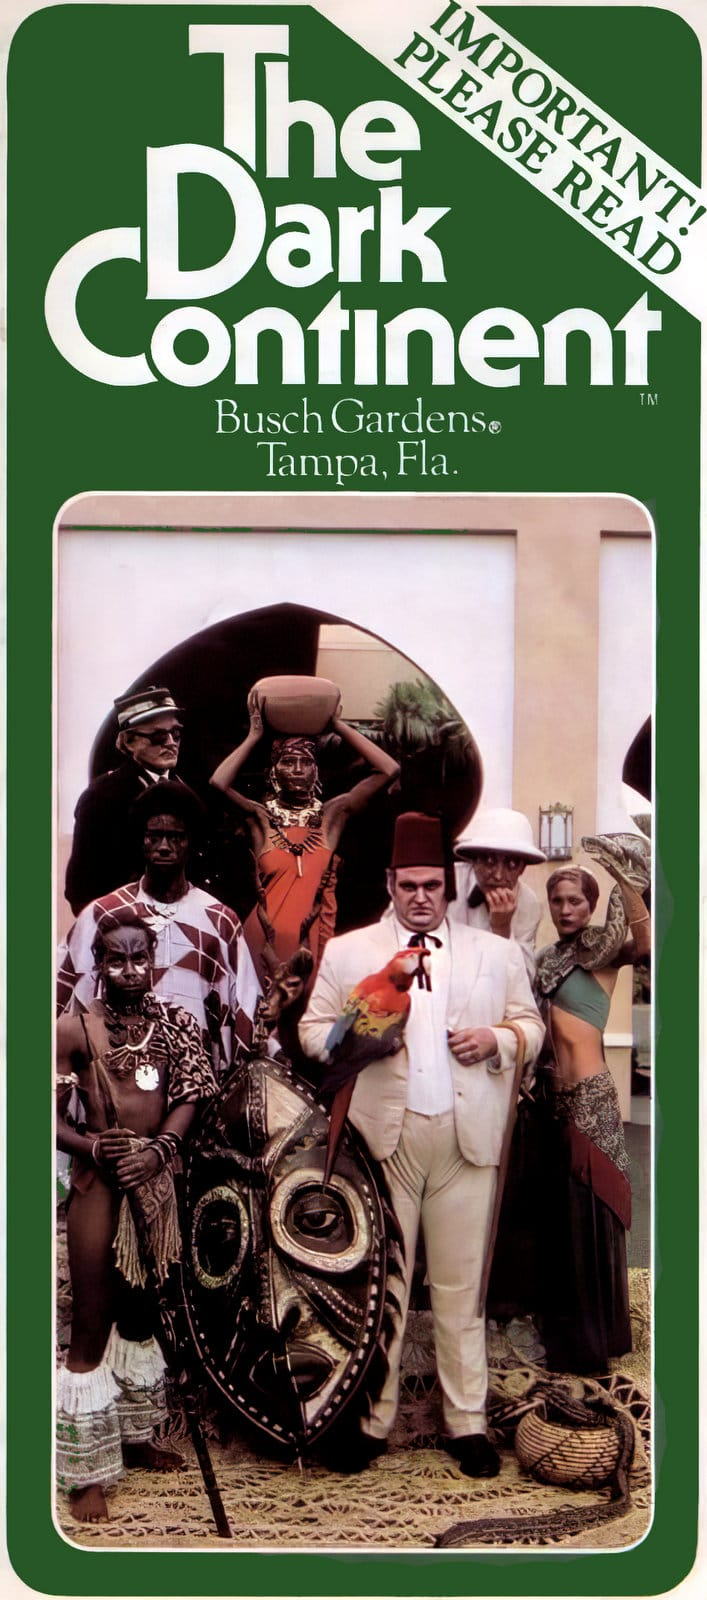 Vintage Busch Gardens Tampa brochure (1970s)